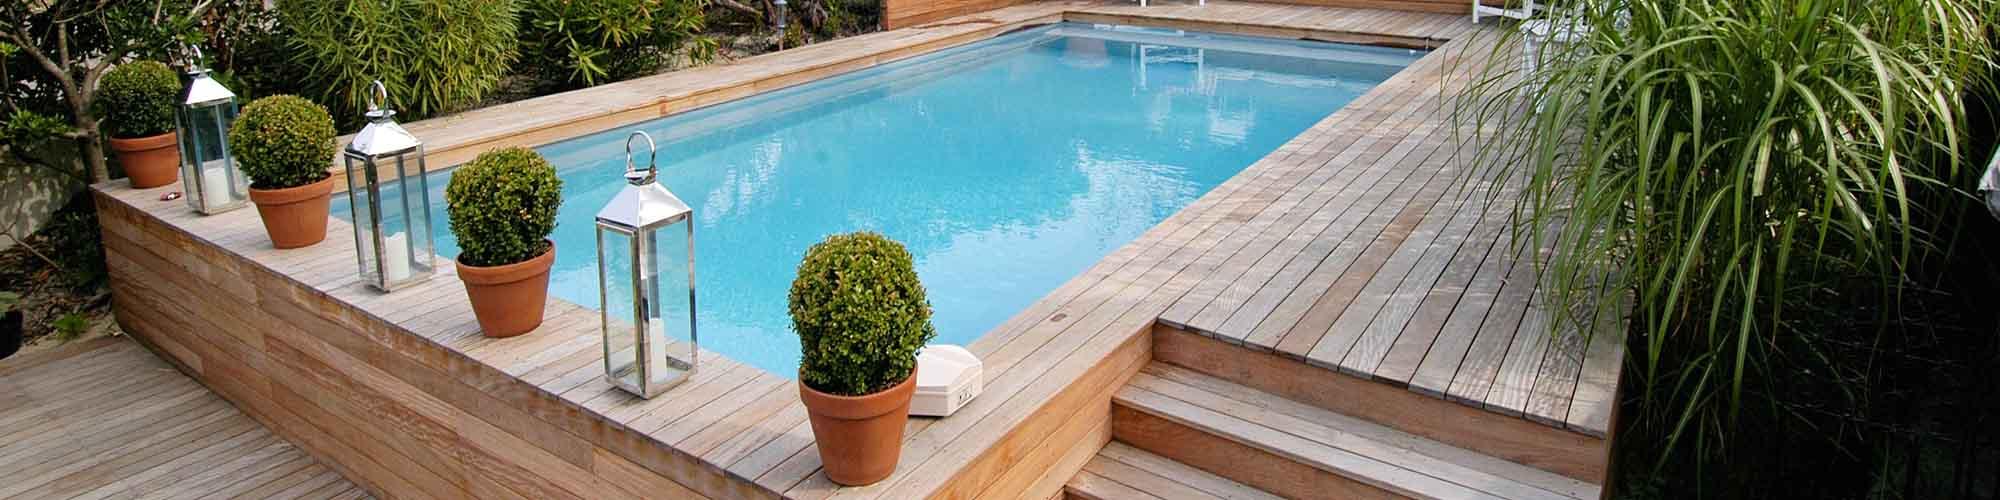 devis piscine enterre top prix piscine coque cout piscine enterre livre en kit cette piscine. Black Bedroom Furniture Sets. Home Design Ideas